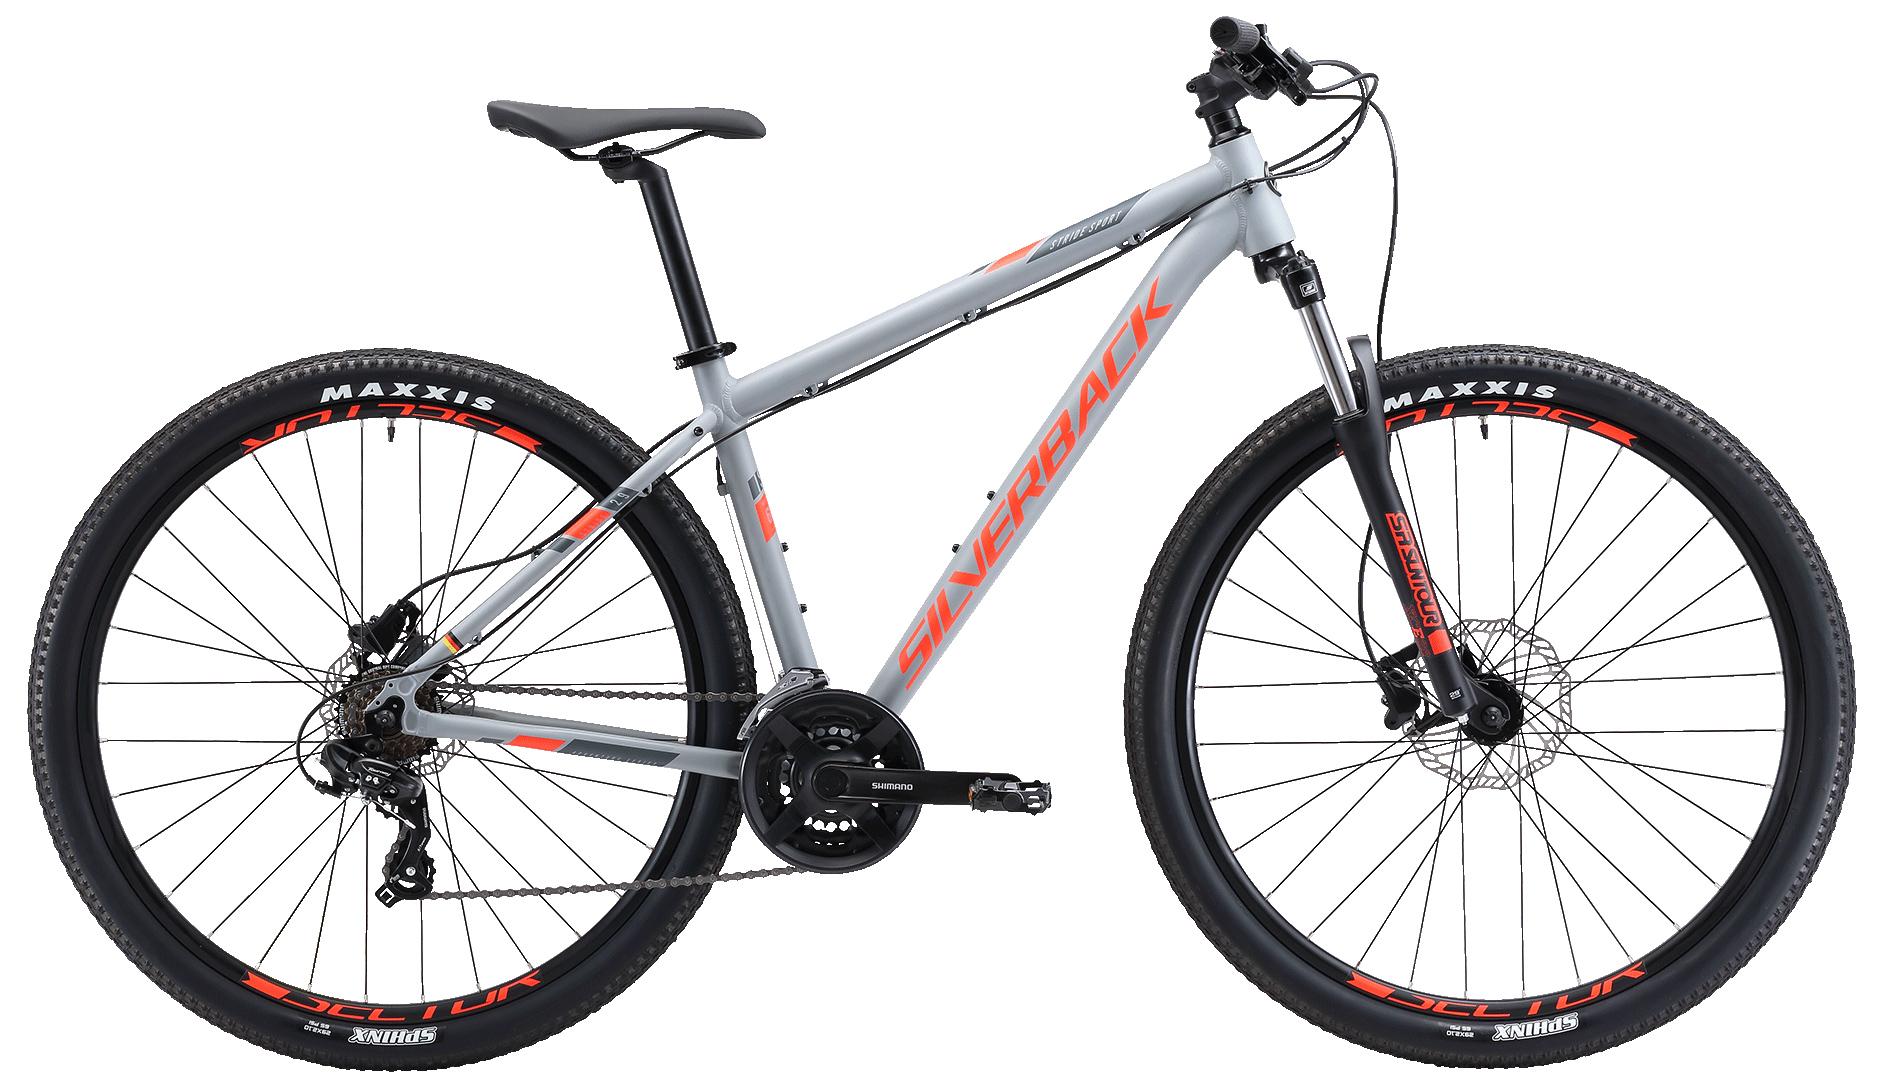 Велосипед Silverback Stride 29 Sport 2019 велосипед silverback stride 15 2016